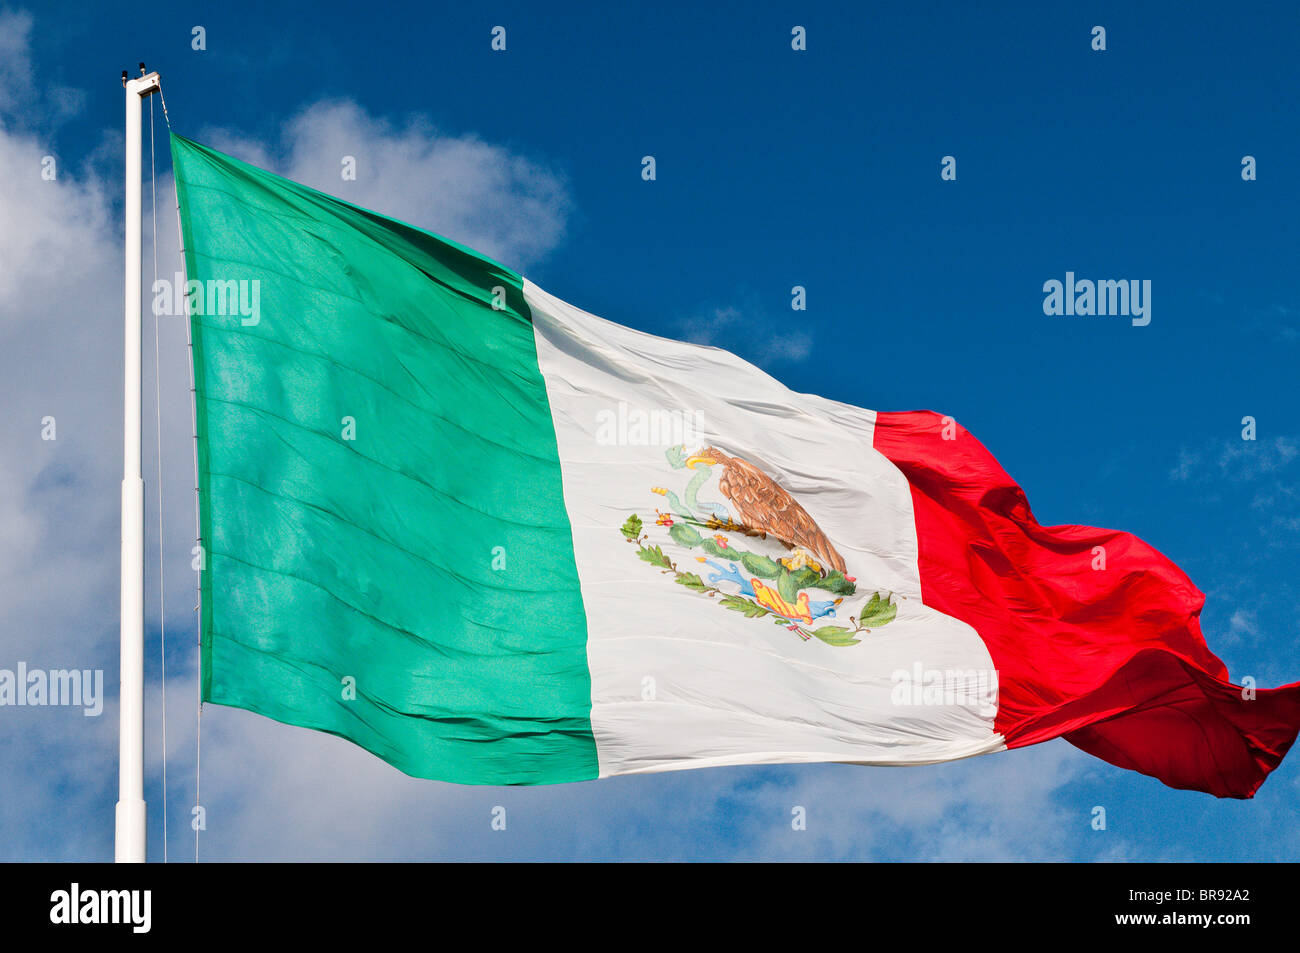 Mexico, Cozumel. Discover Mexico Park, Isla de Cozumel (Cozumel Island). - Stock Image